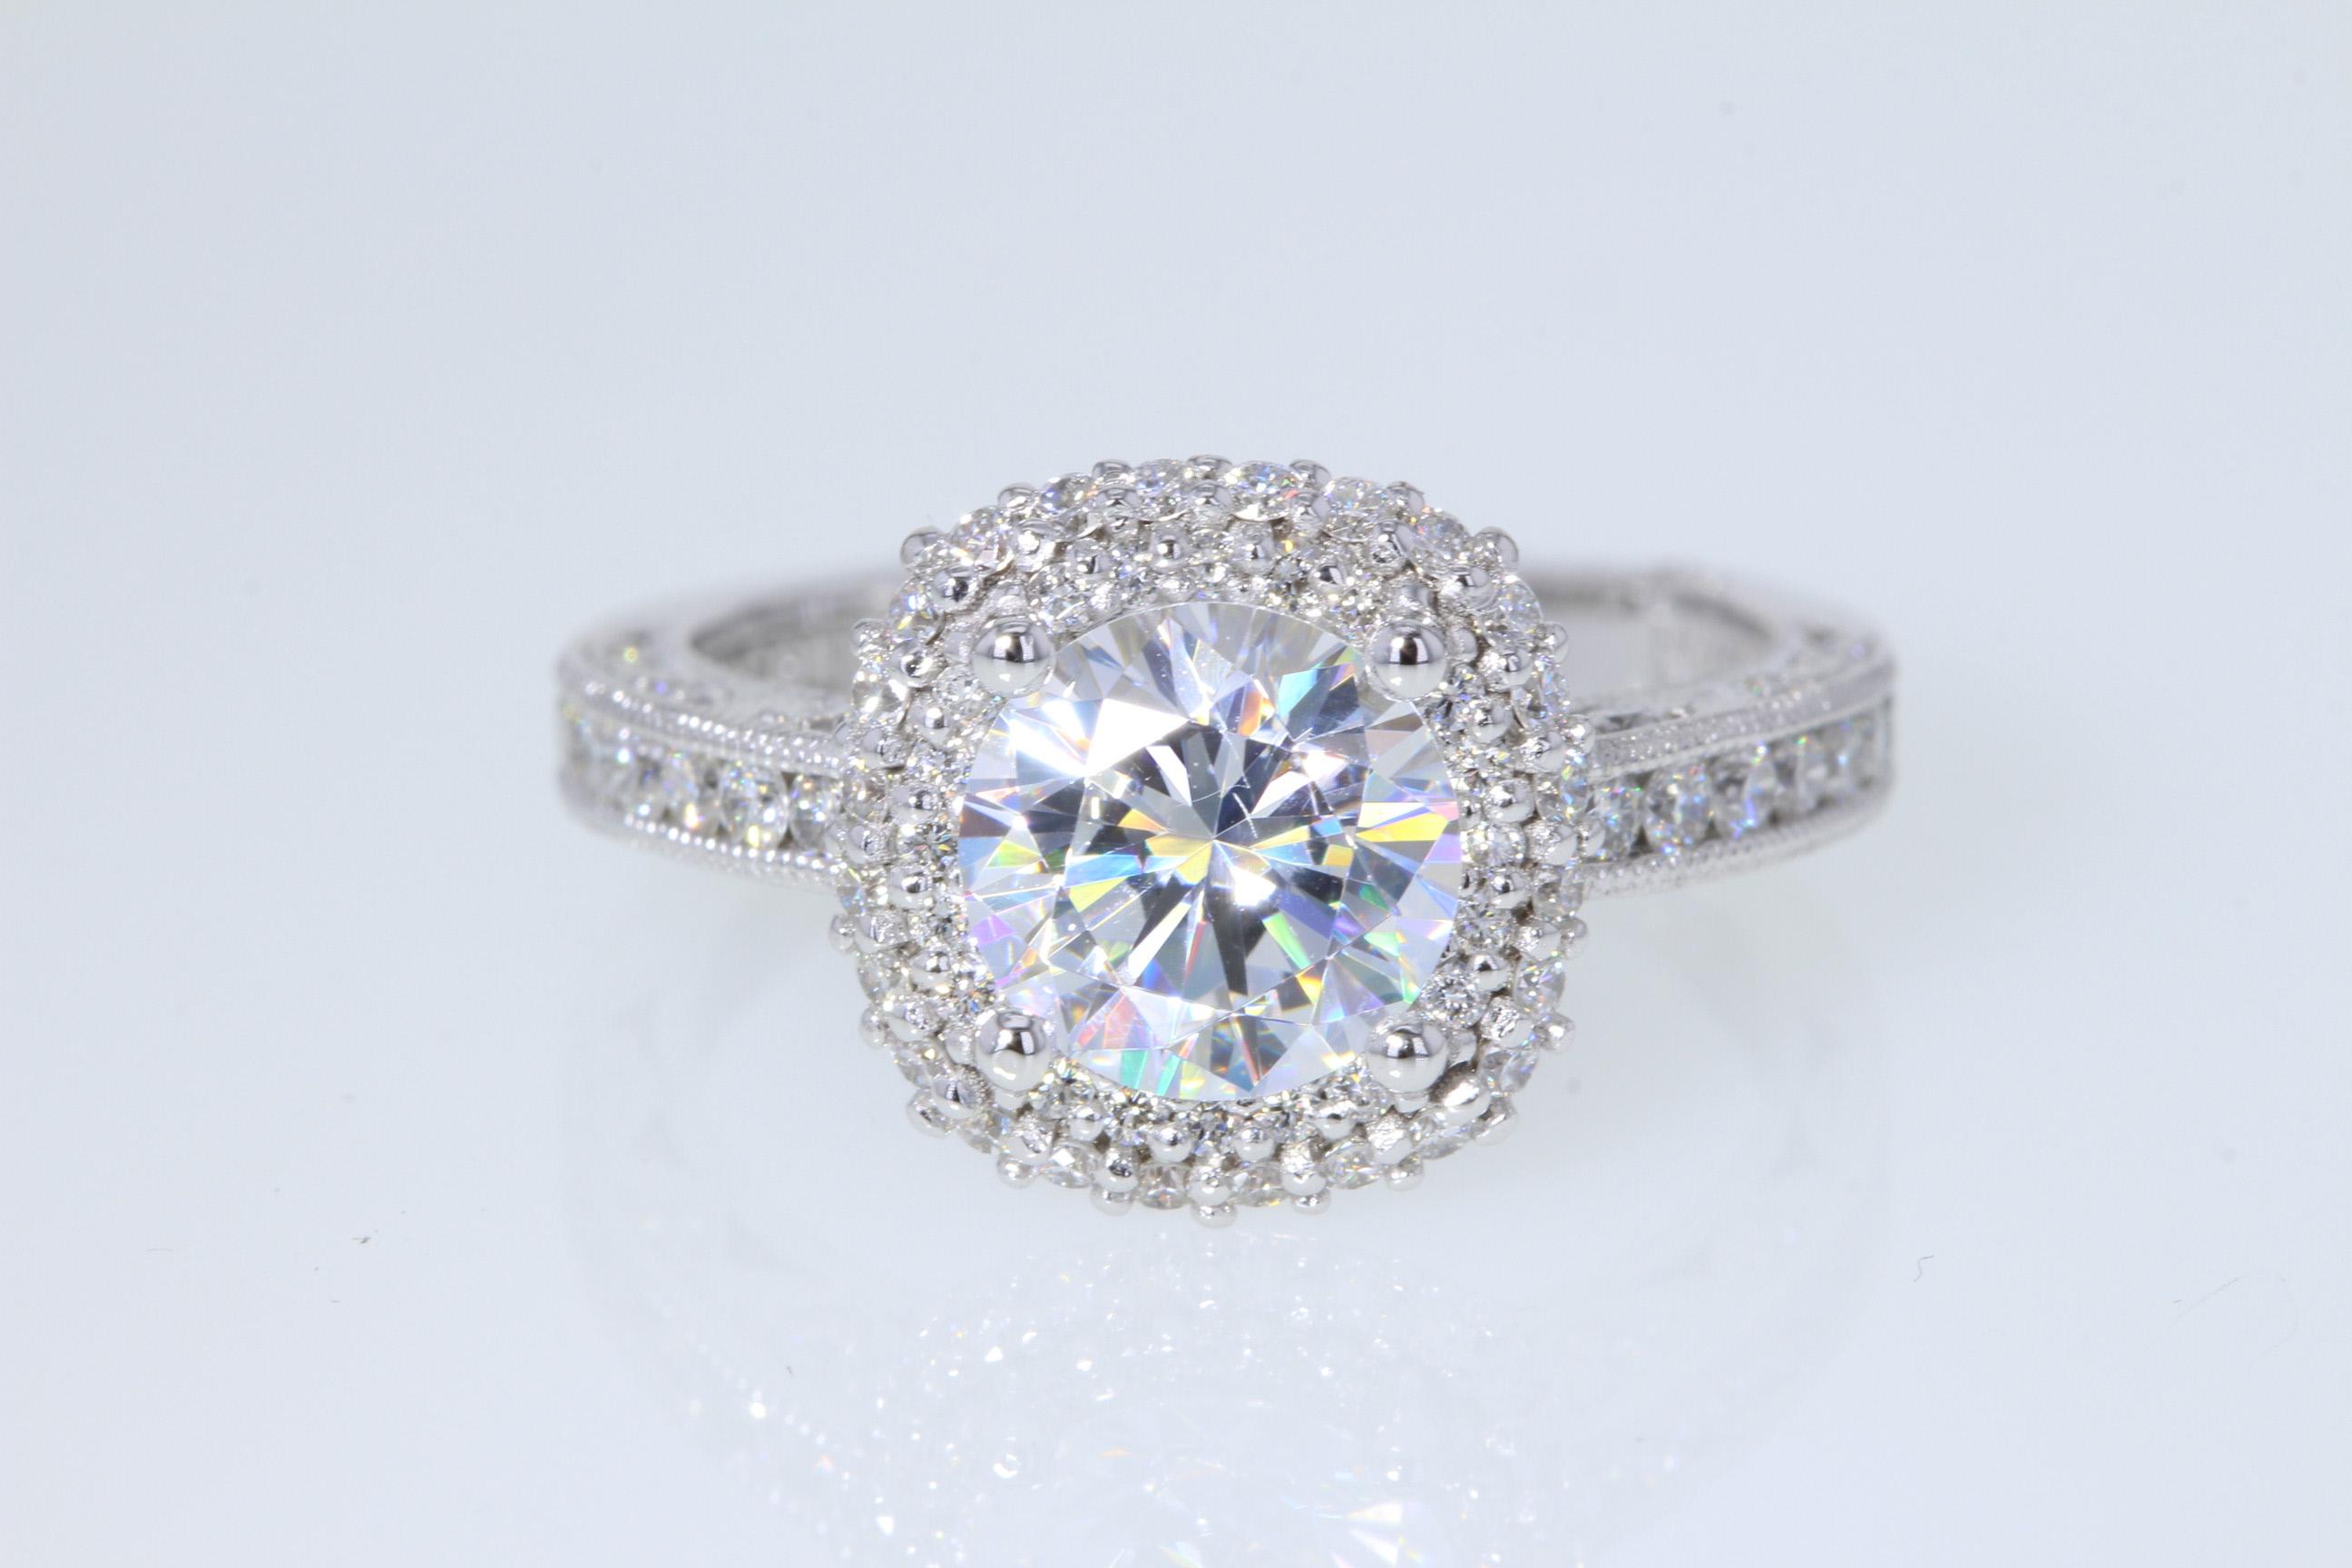 tacori double row cushion halo diamond engagement ring. Black Bedroom Furniture Sets. Home Design Ideas